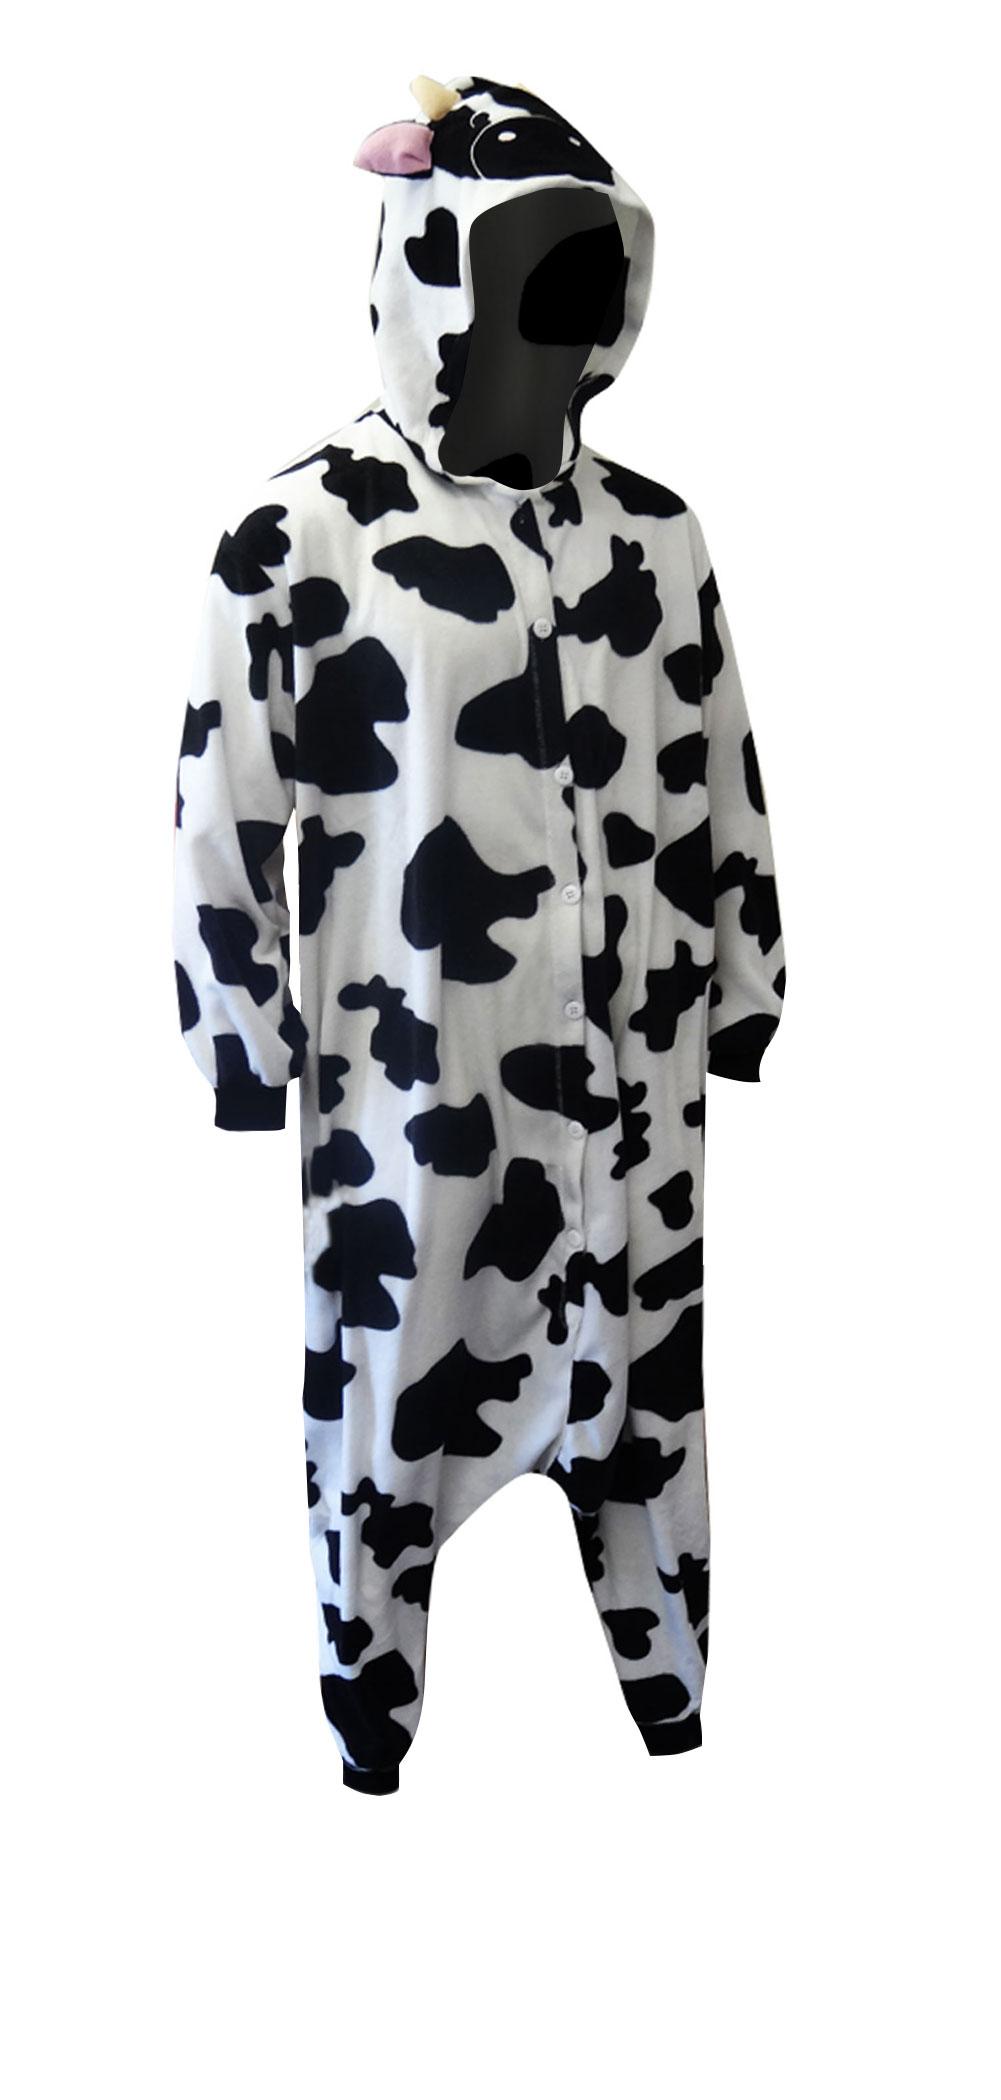 WebUndies.com Spotted Cow Low Rider Hooded One Piece Pajama